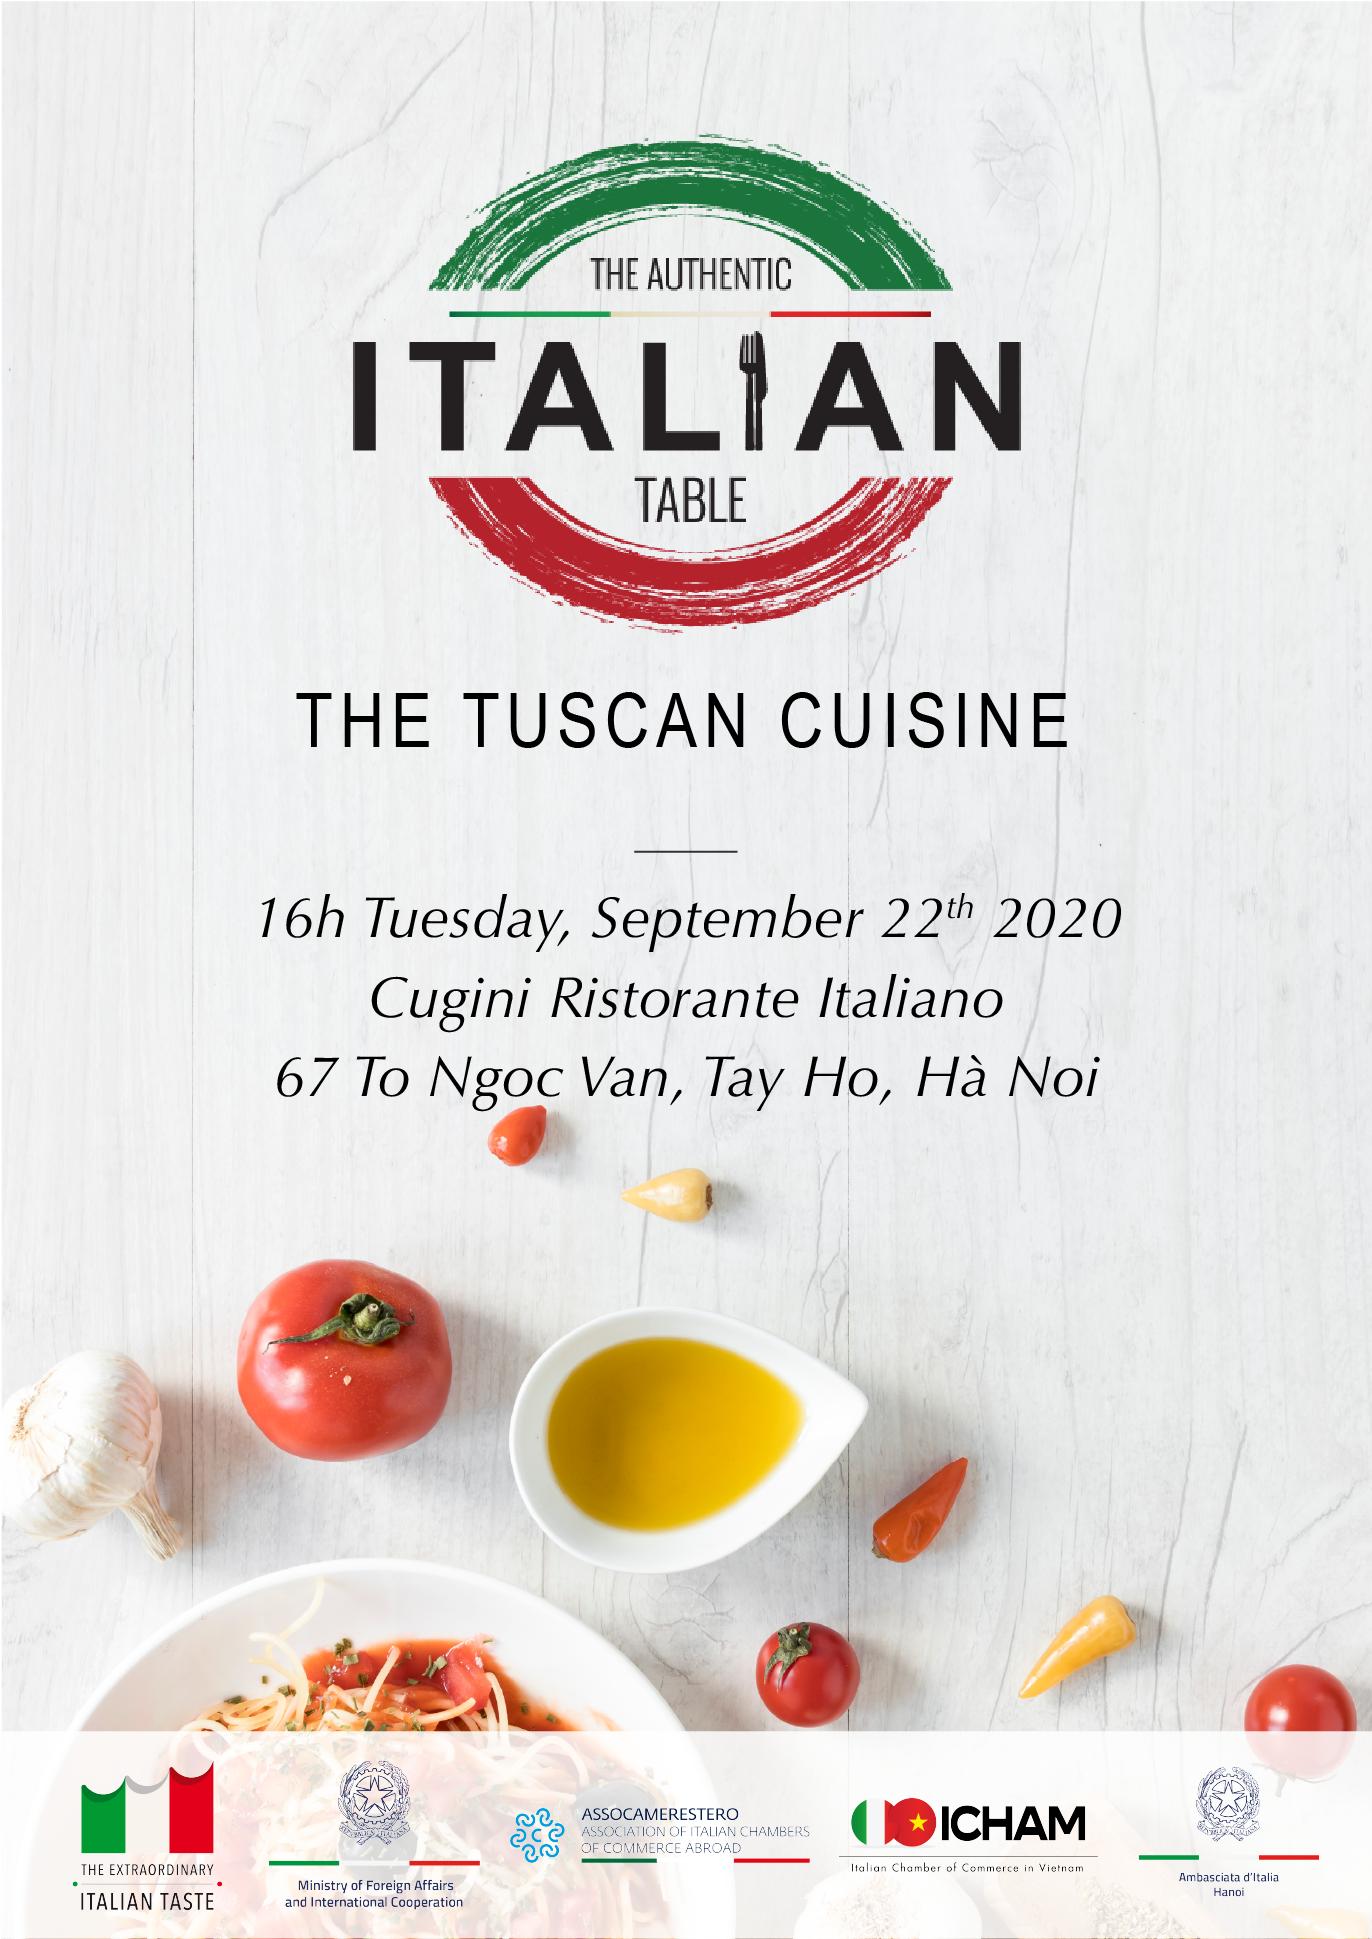 Authentic Italian Table - The Tuscan cuisine